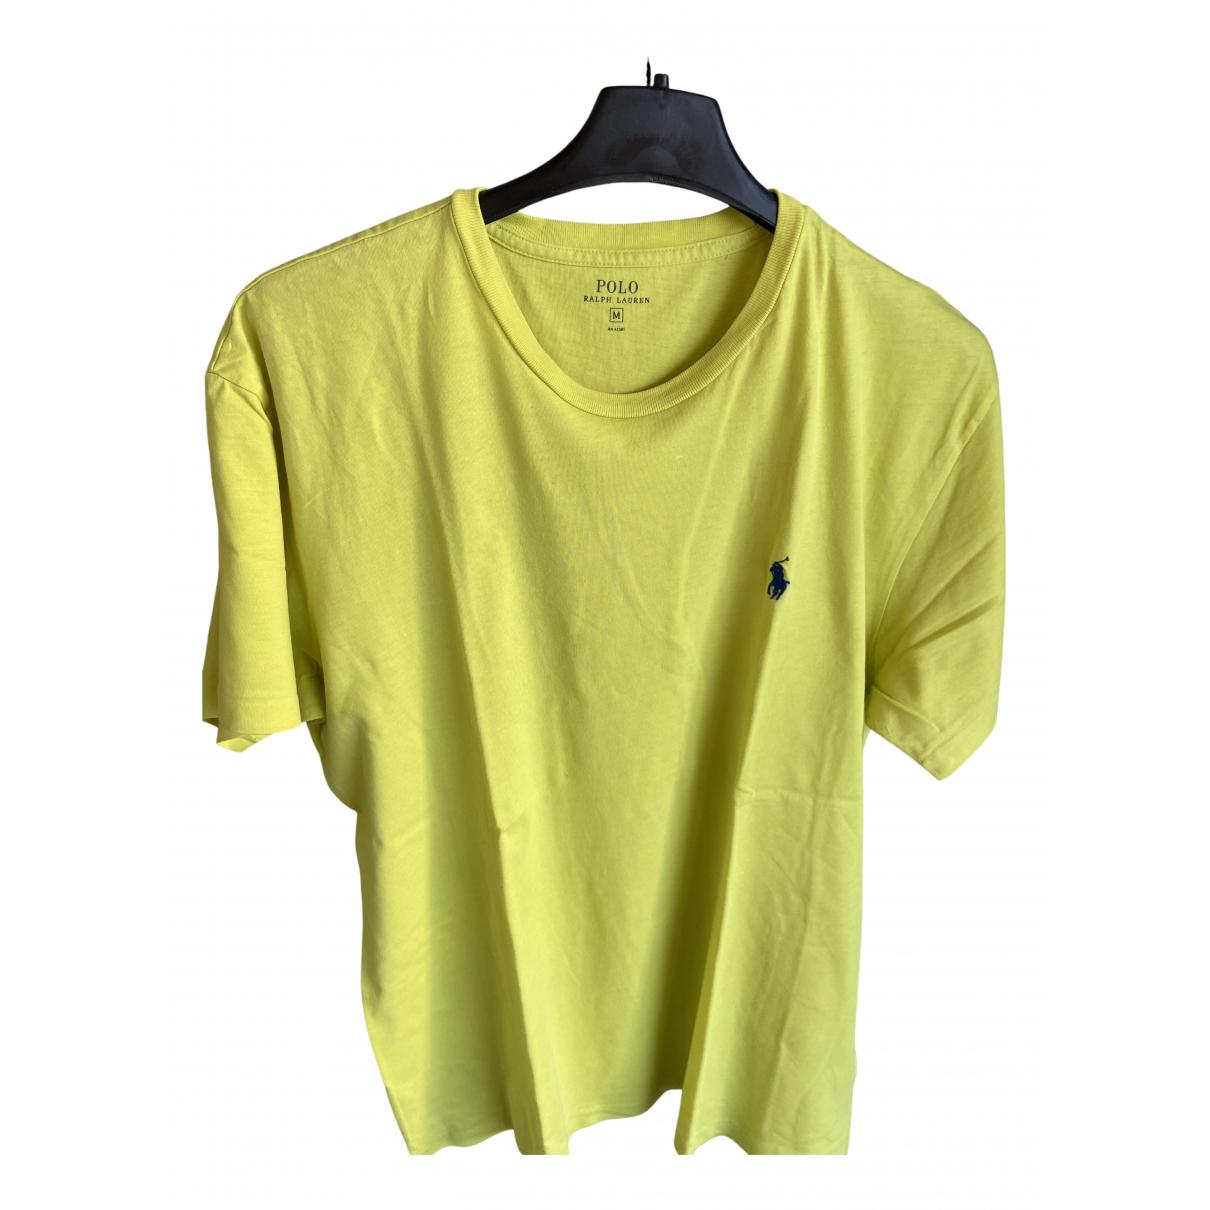 Polo Ralph Lauren \N T-Shirts in  Gelb Baumwolle